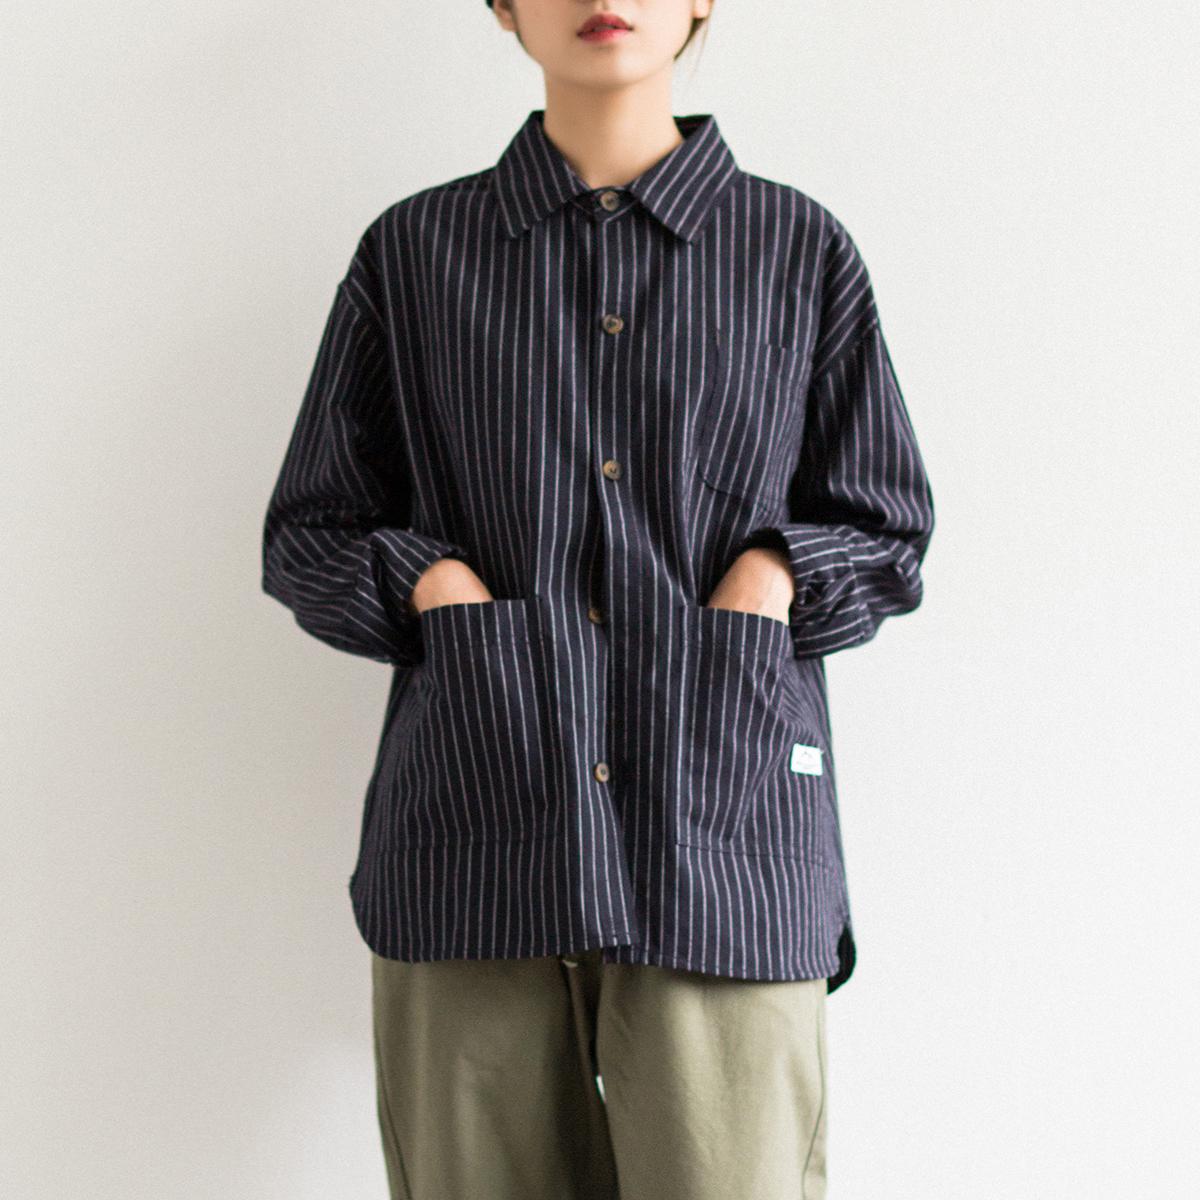 EpicSocotra18/AW美式多口袋條紋長袖襯衫男女同款工裝襯衣薄外套